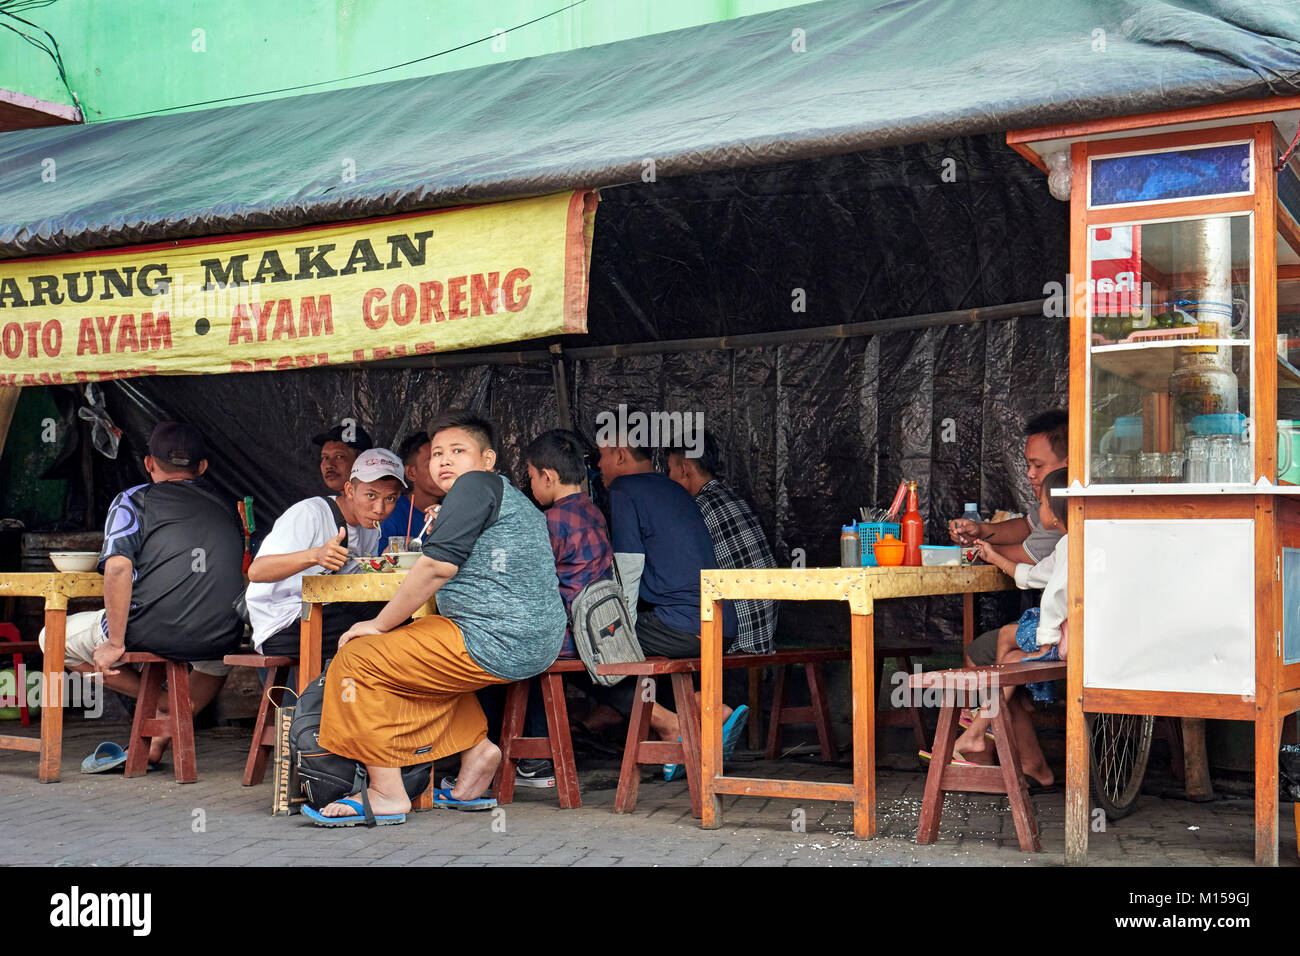 Les gens de manger dans un petit restaurant de rue sur Ketandan Wetan street. Yogyakarta, Java, Indonésie. Photo Stock